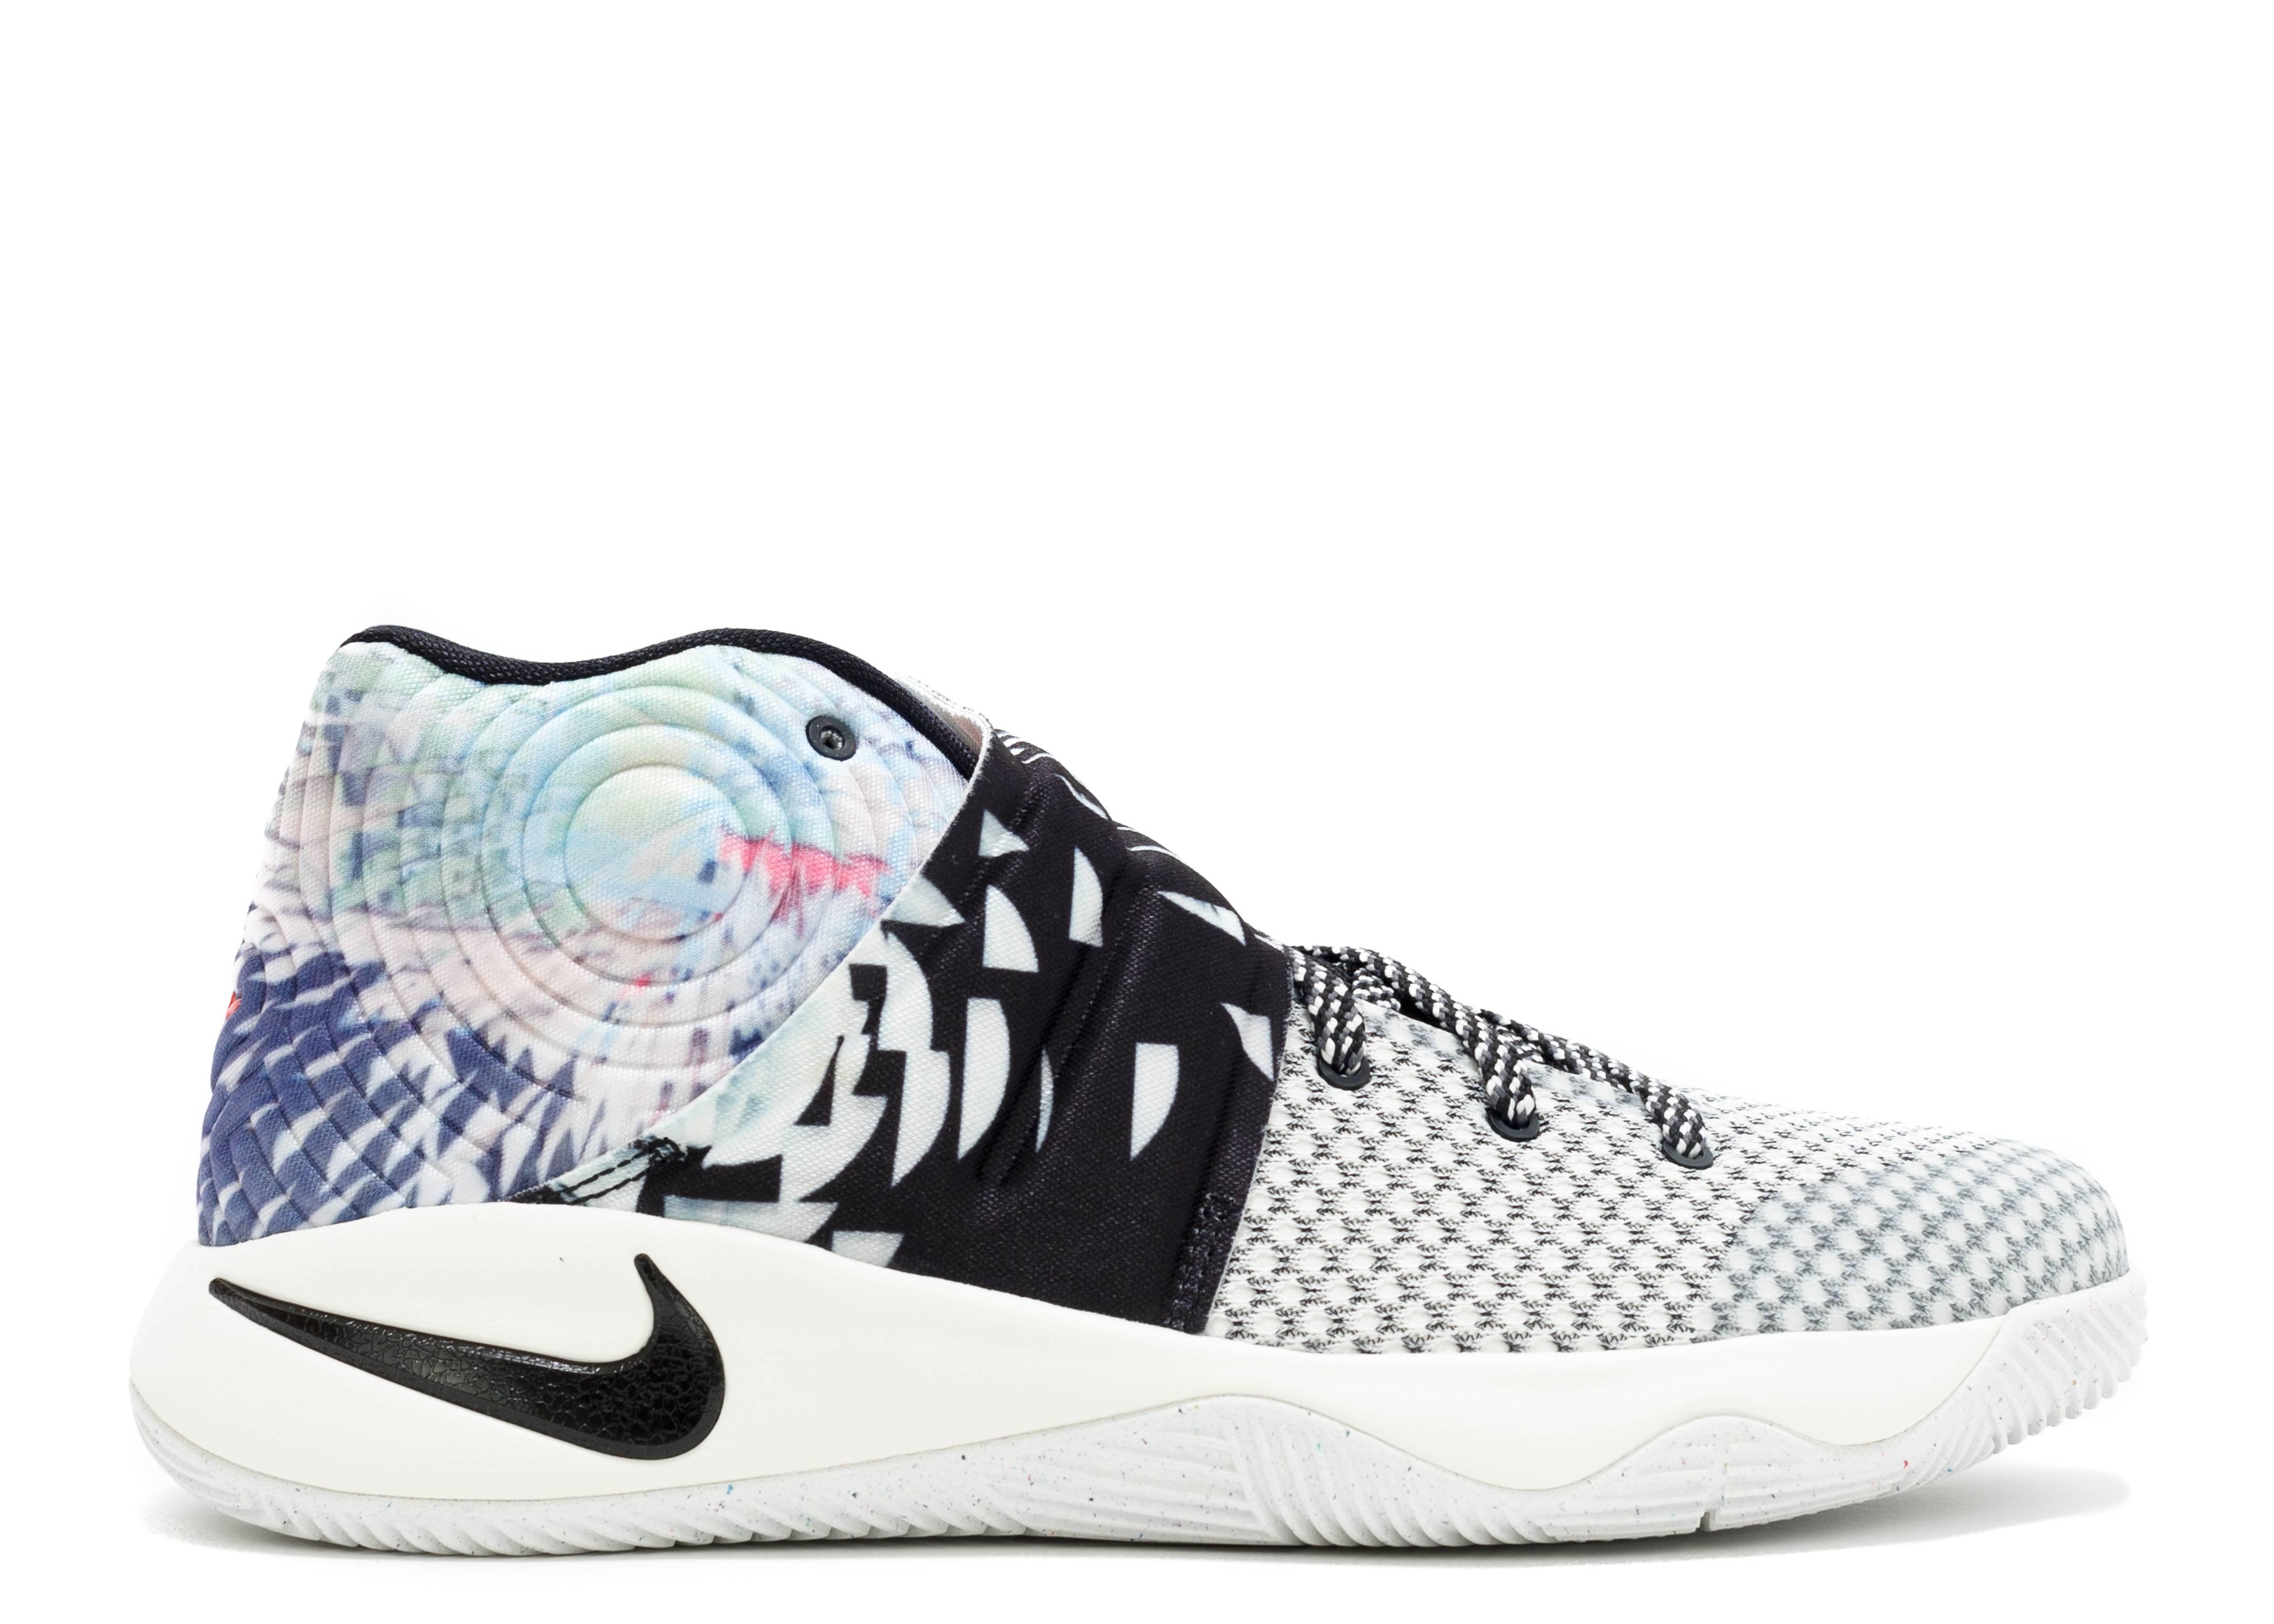 Kid's Nike Kyrie 2 II (GS) The Effect Multi Color Black Sneakers : A97y2196